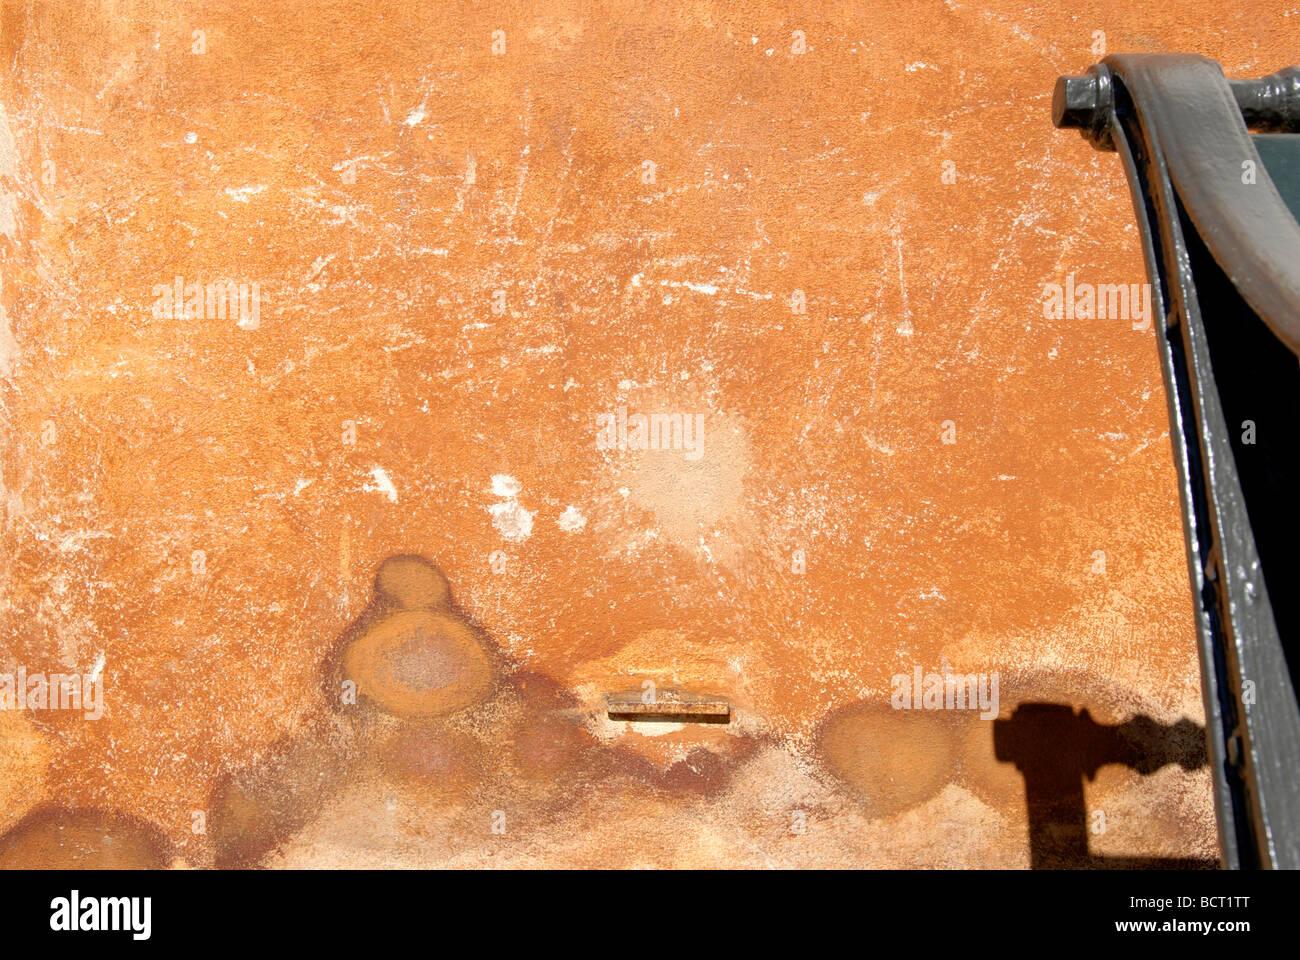 Mur Ocre mur ocre banque d'images, photo stock: 25114568 - alamy